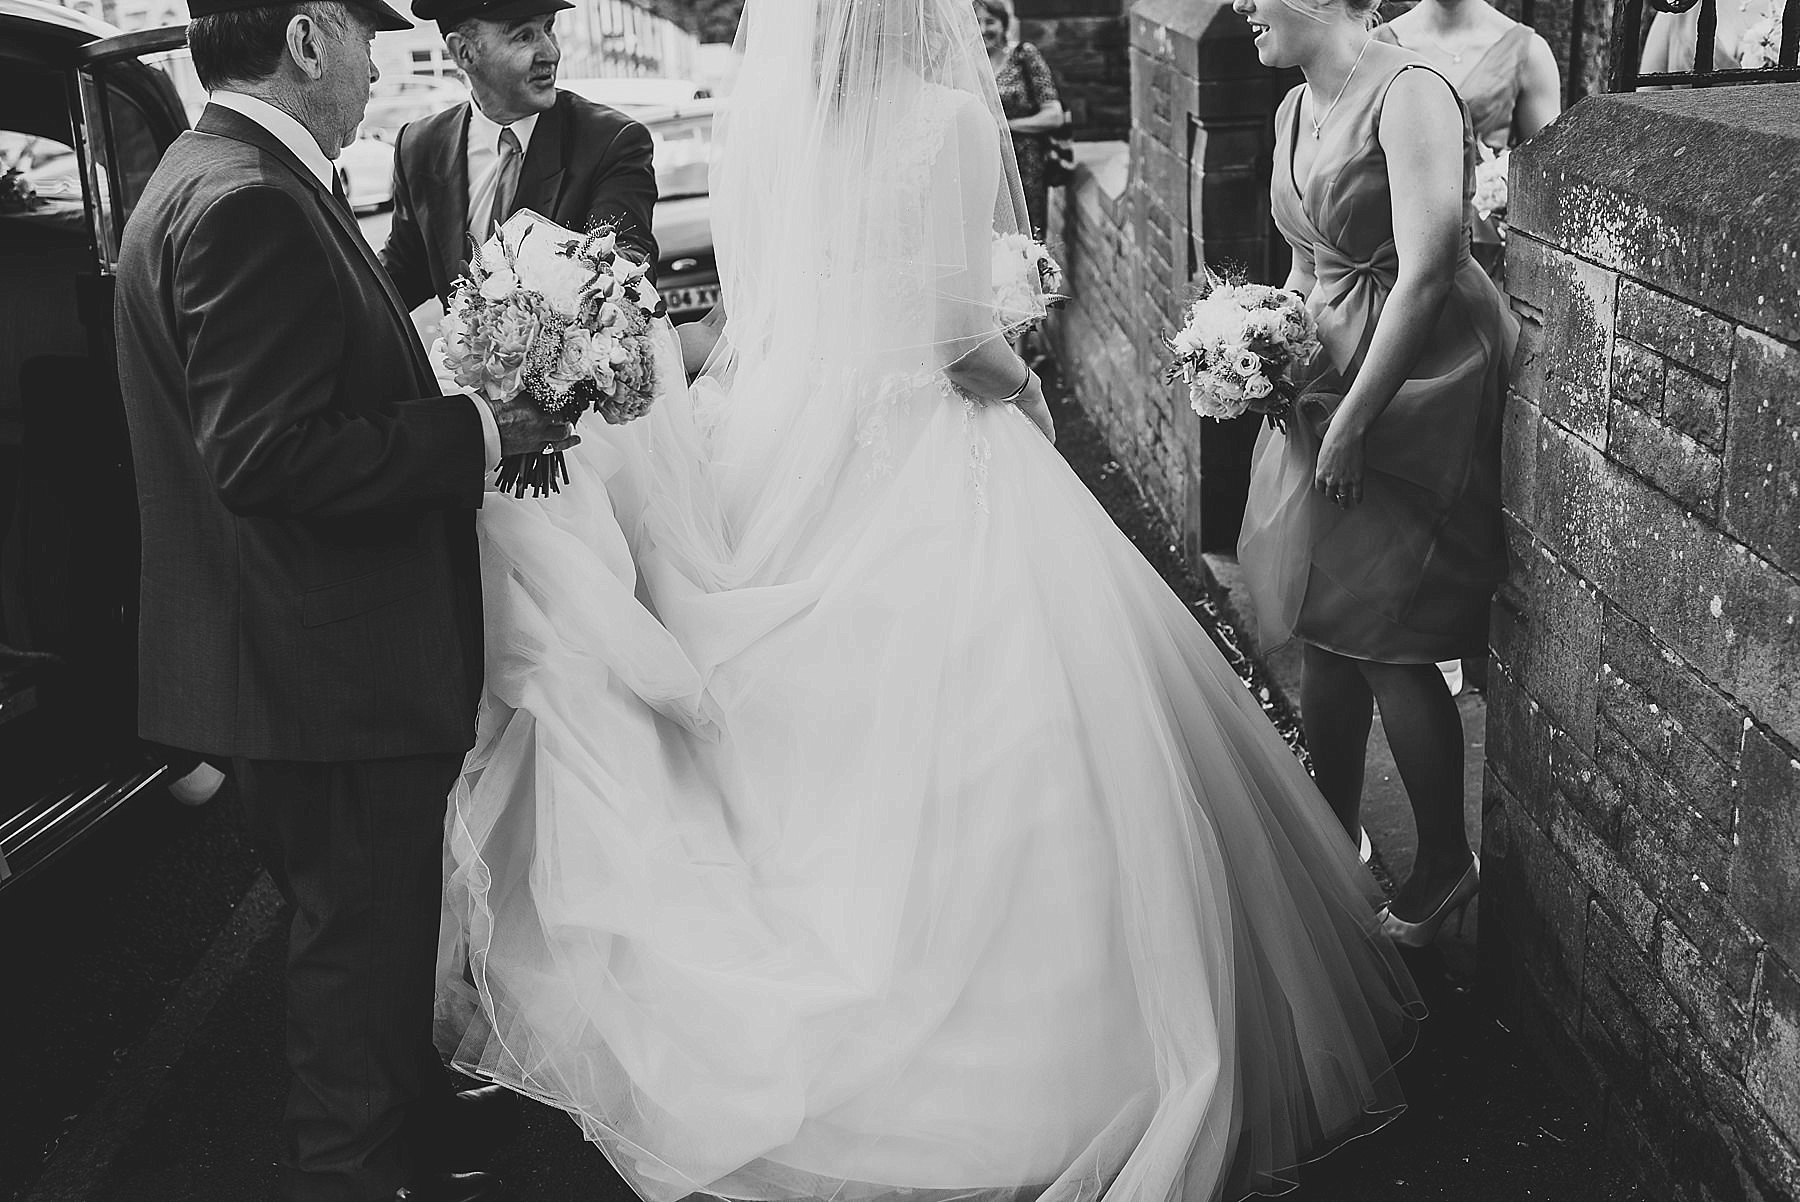 chauffeurs holding wedding dress